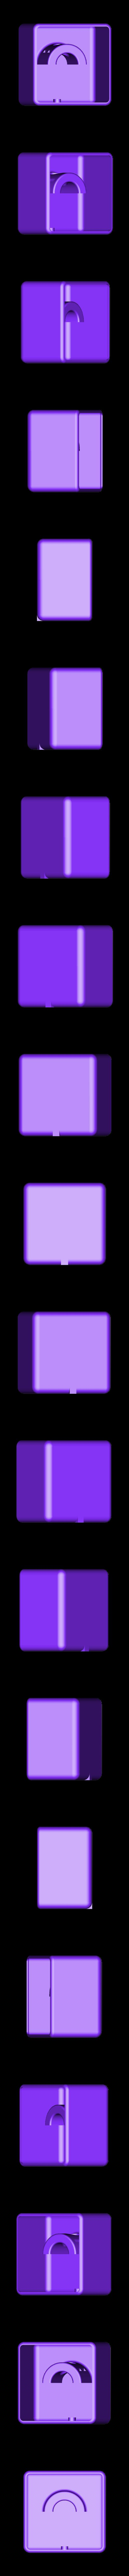 Lamp_-_Base.stl Download free STL file Cube Lamp • Design to 3D print, csigshoj